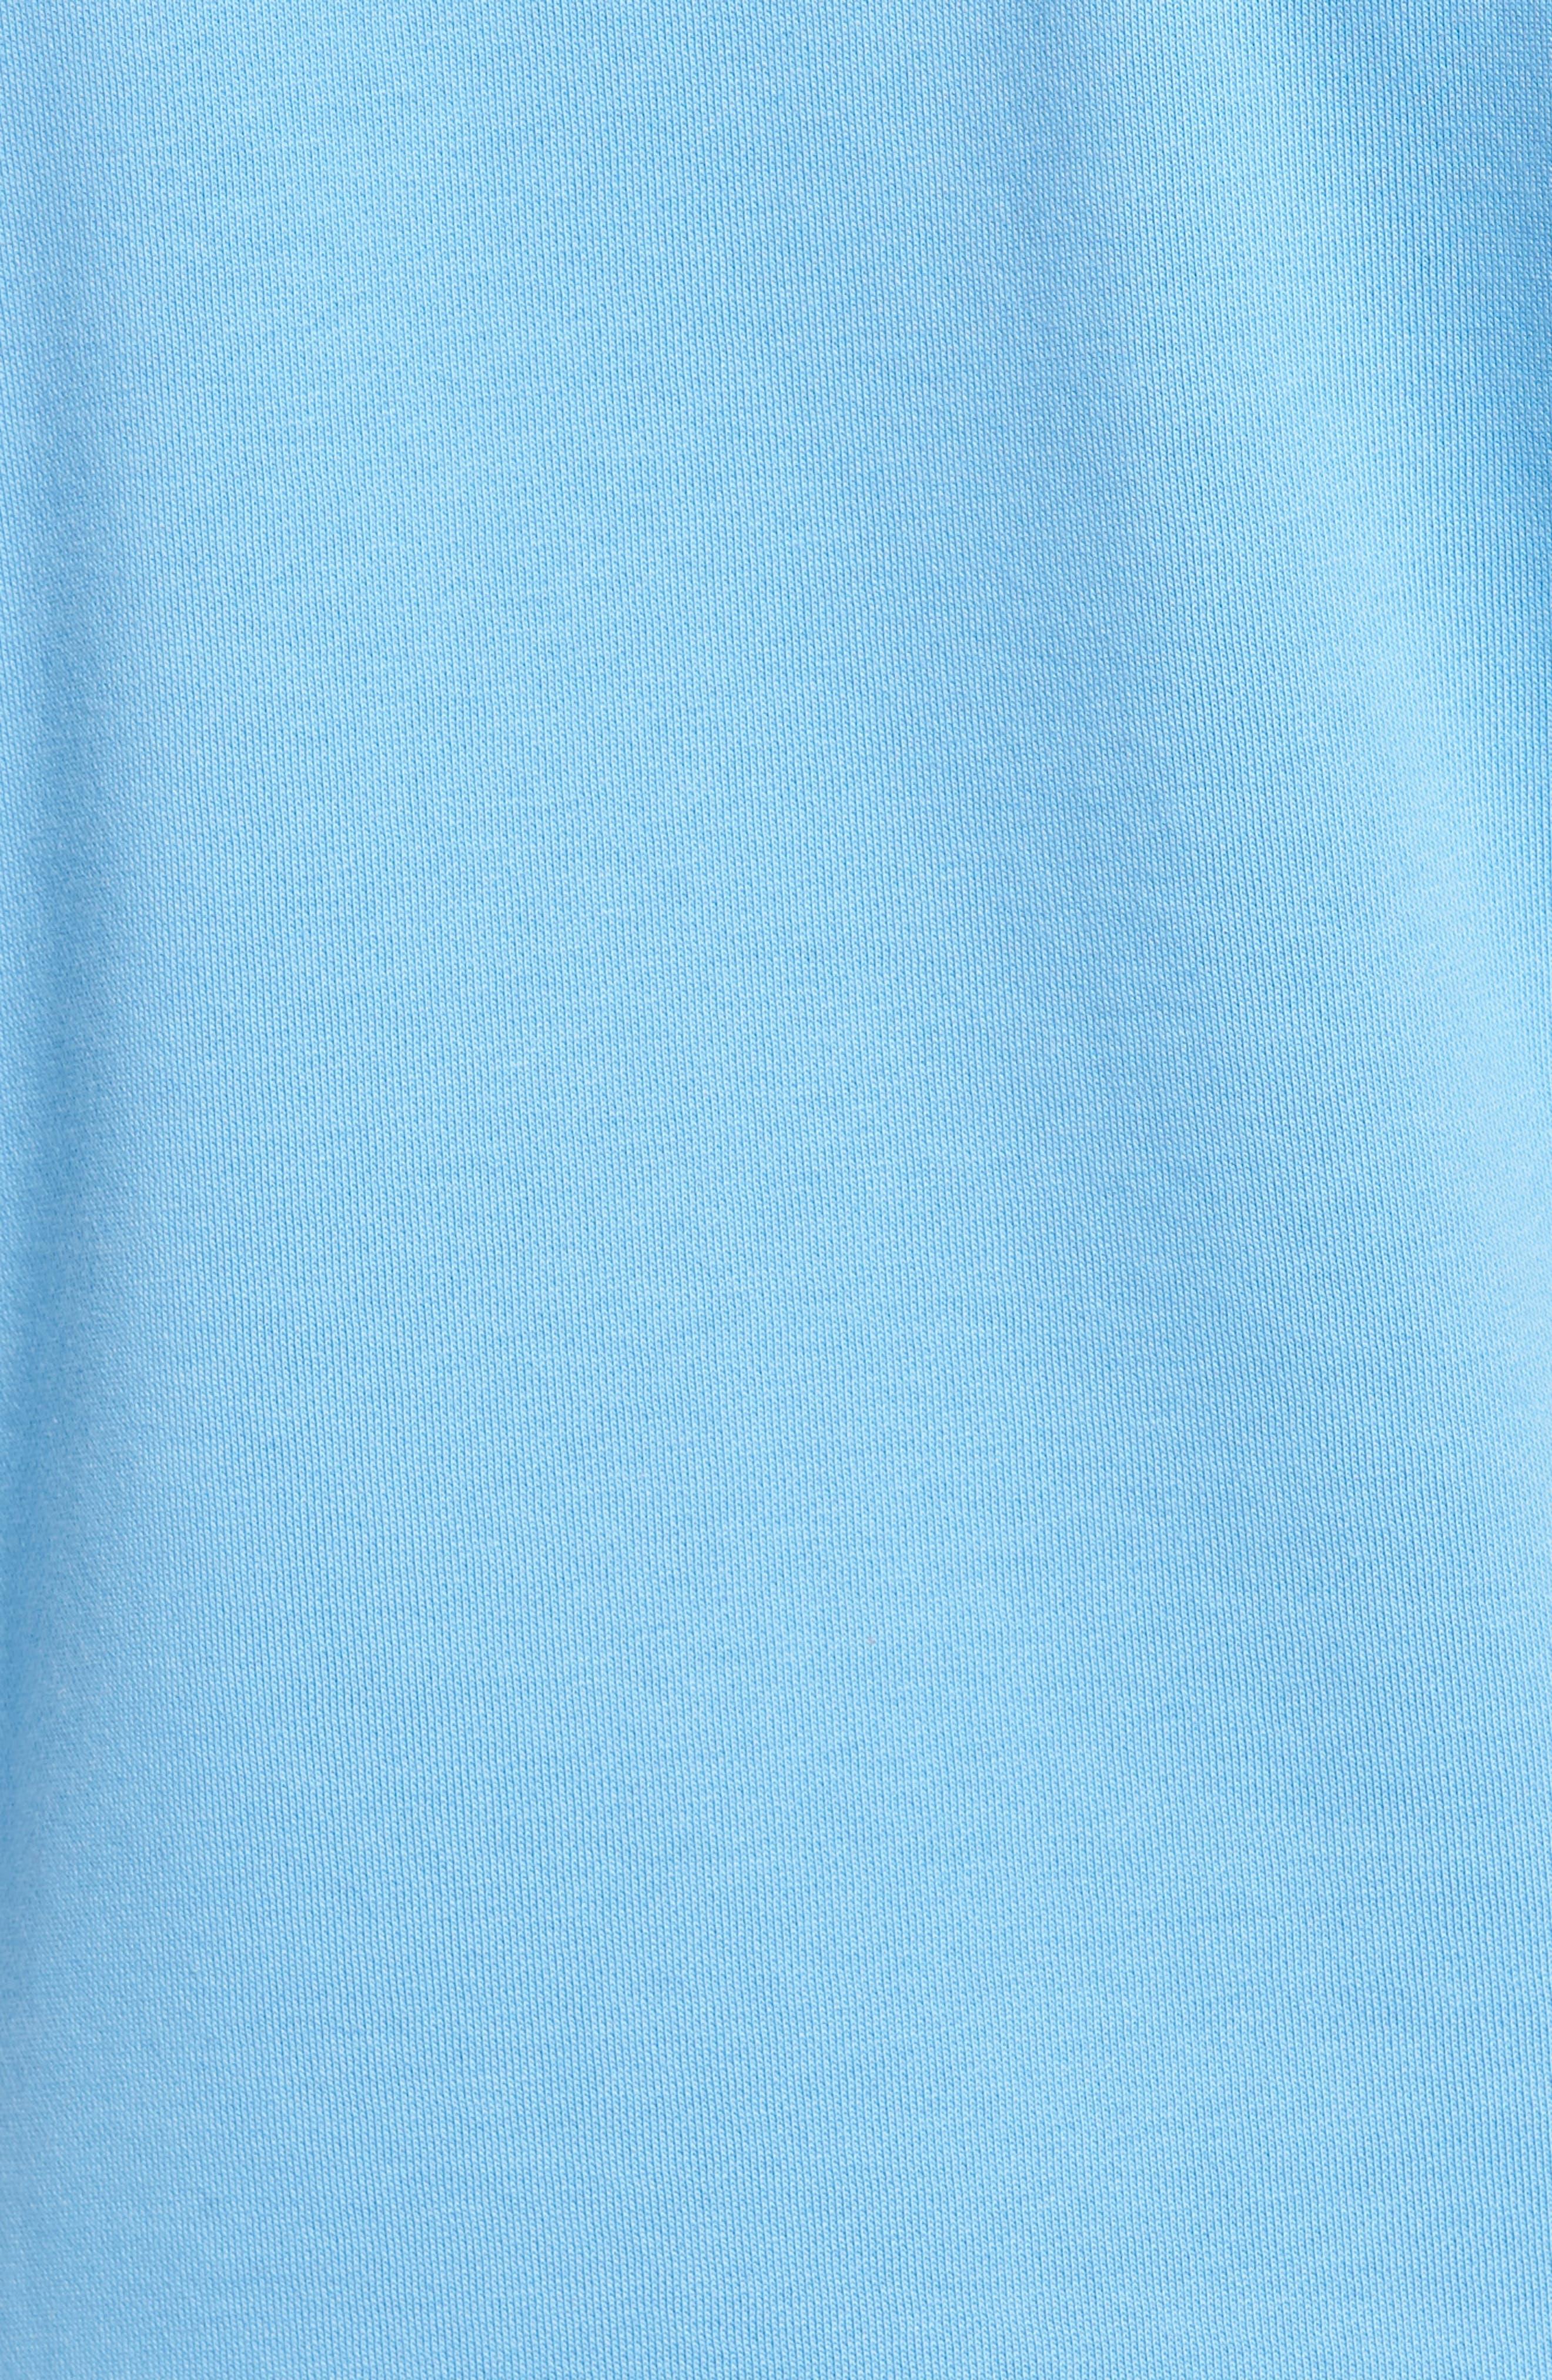 Jamison Hoodie,                             Alternate thumbnail 5, color,                             Blue/ Peacoat/ White